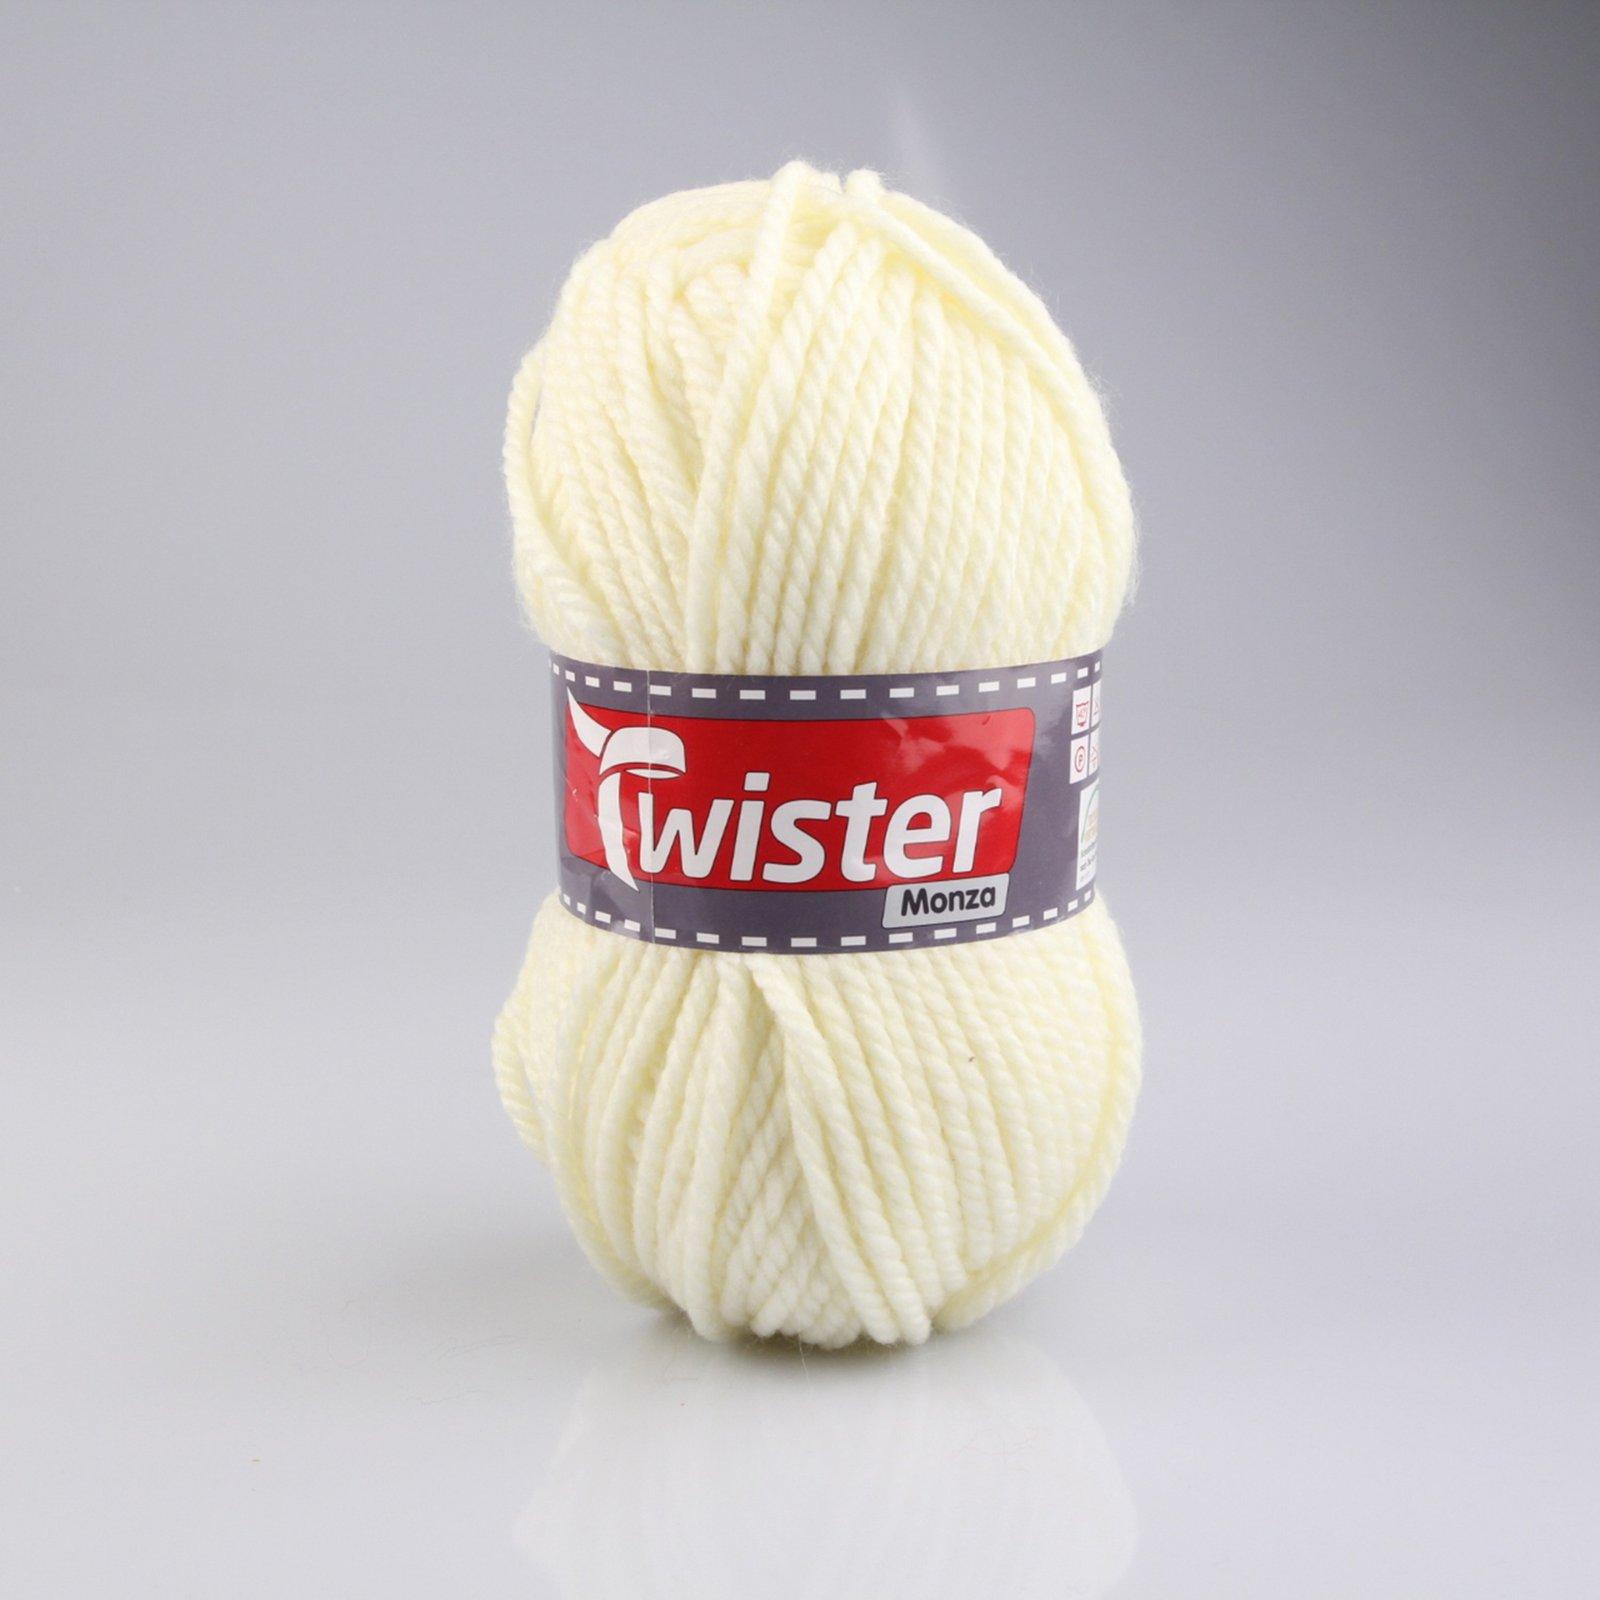 Wolle TWISTER MONZA - wollweiß - 200g